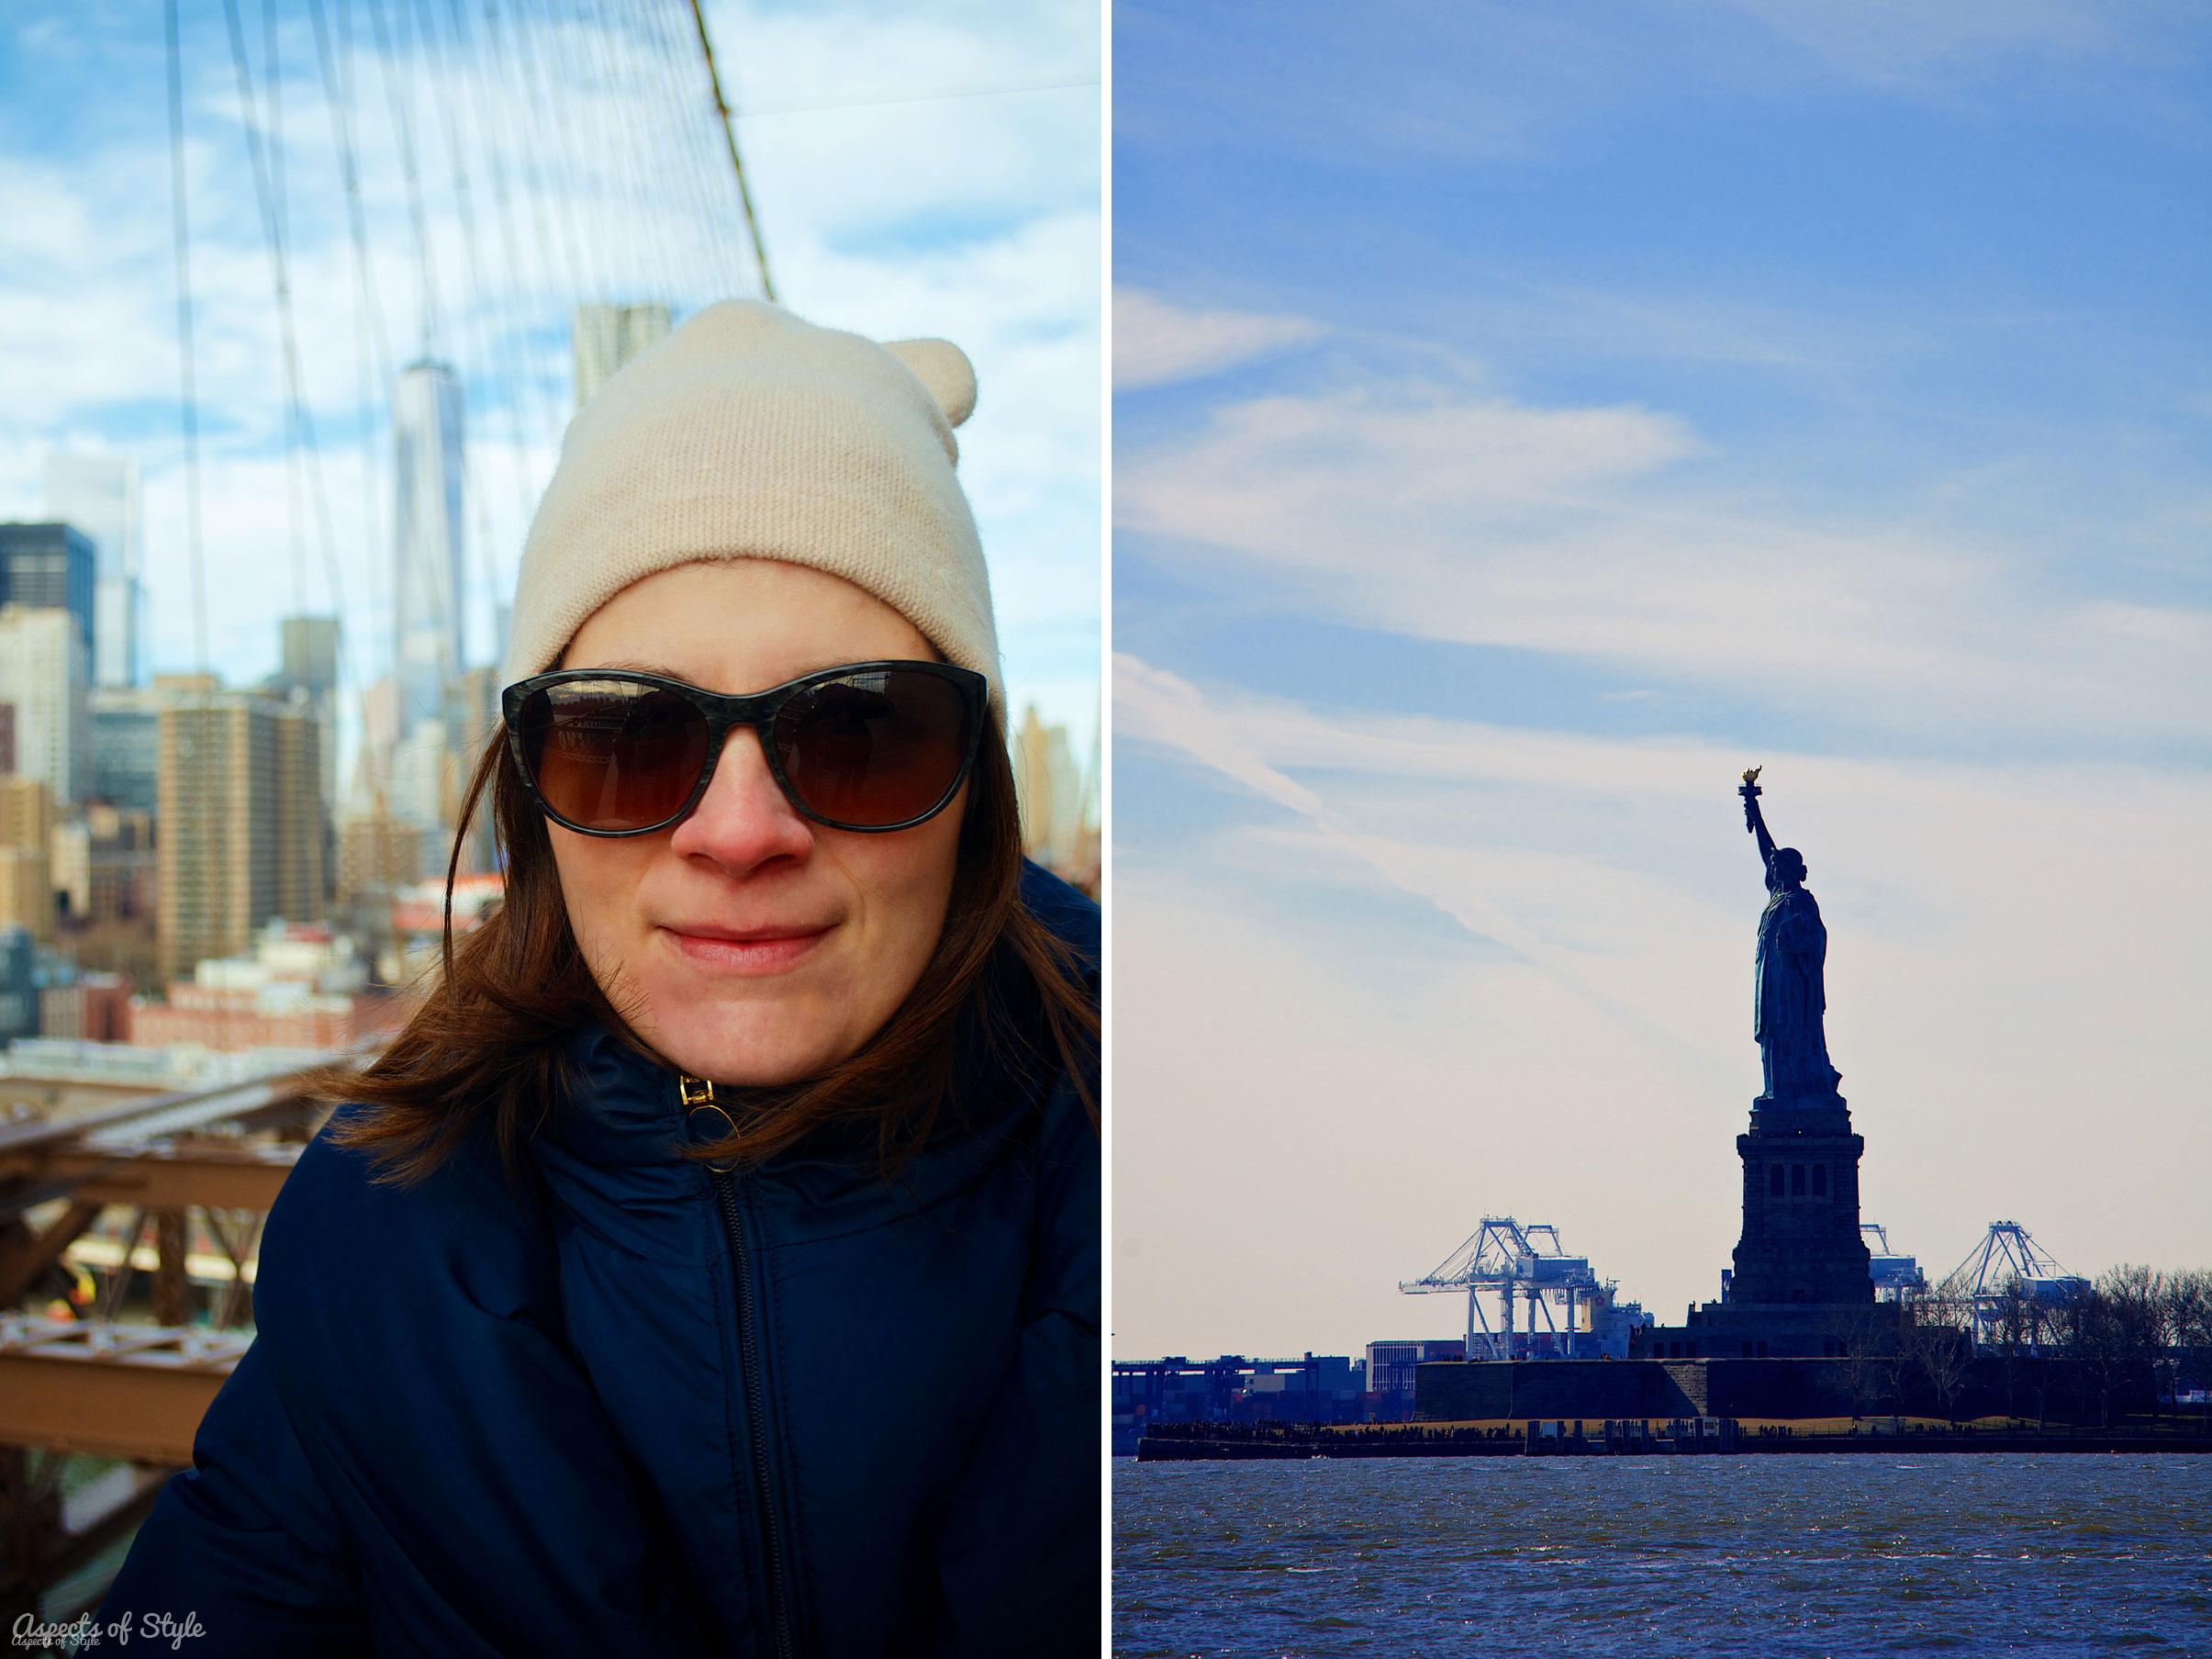 Anna in Brooklyn Bridge and Statue of Liberty